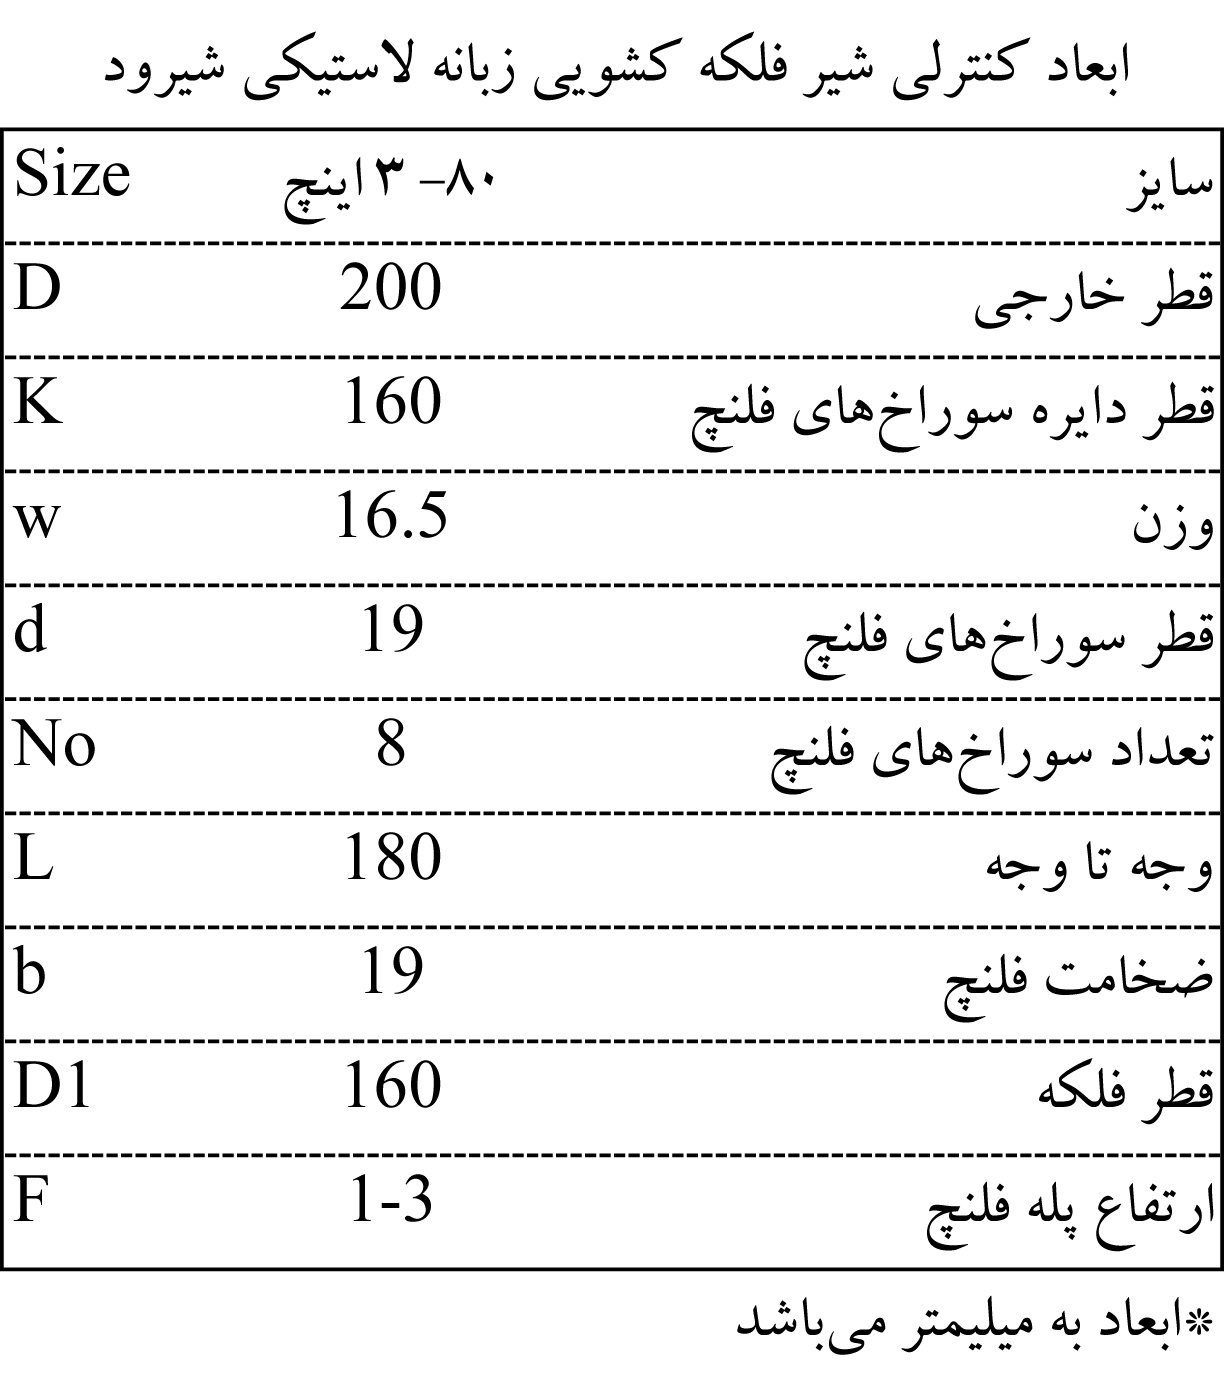 shirood 80 mm 16 bar